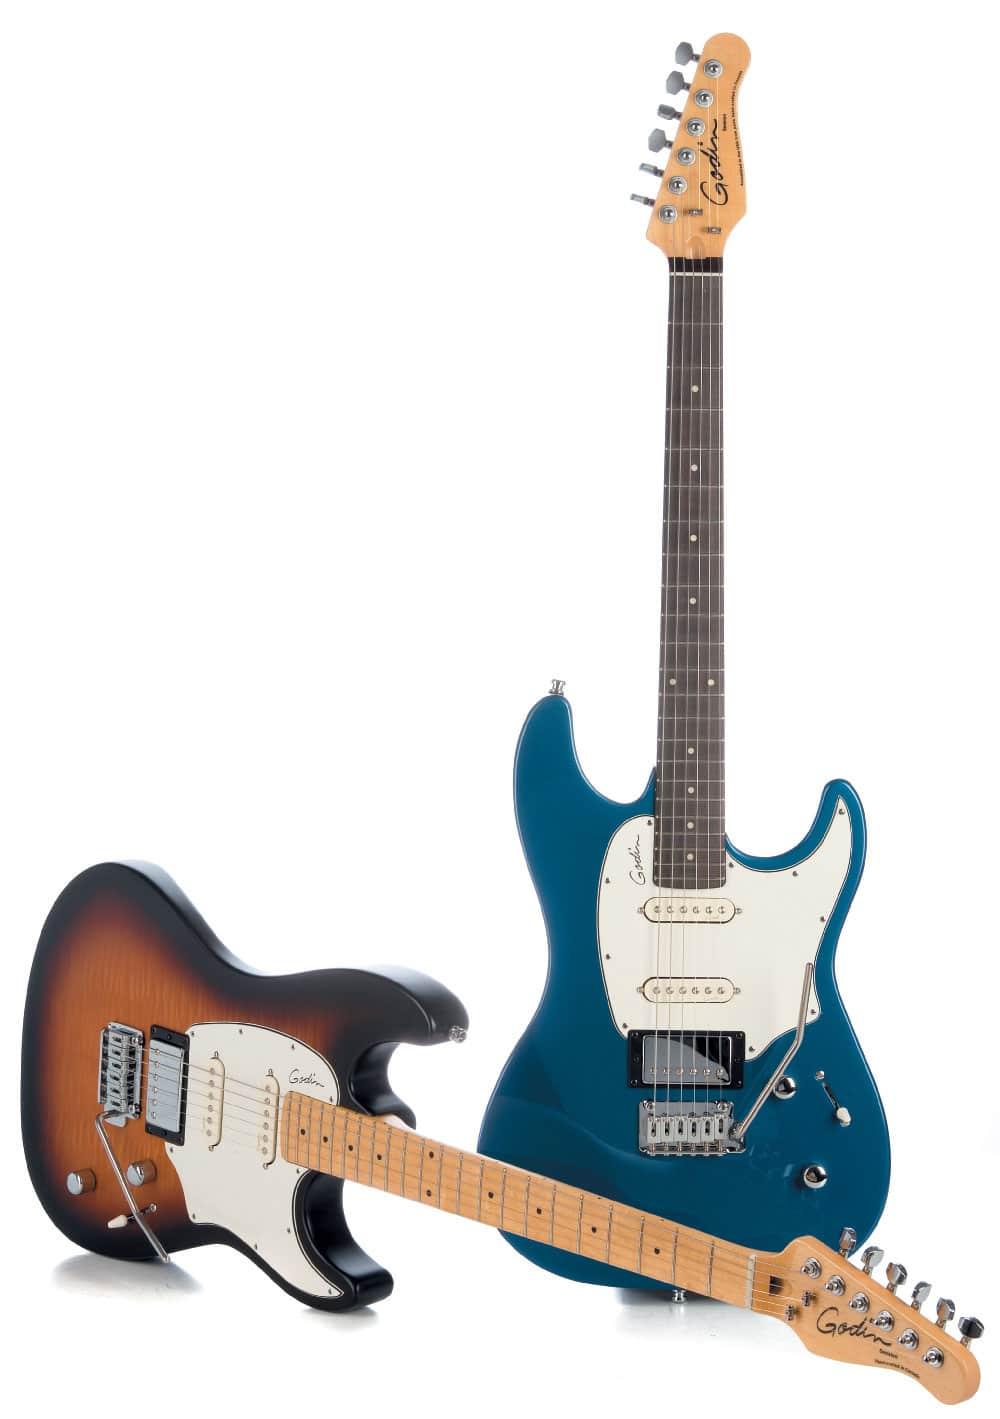 Zwei Godin-E-Gitarren, liegend/stehend